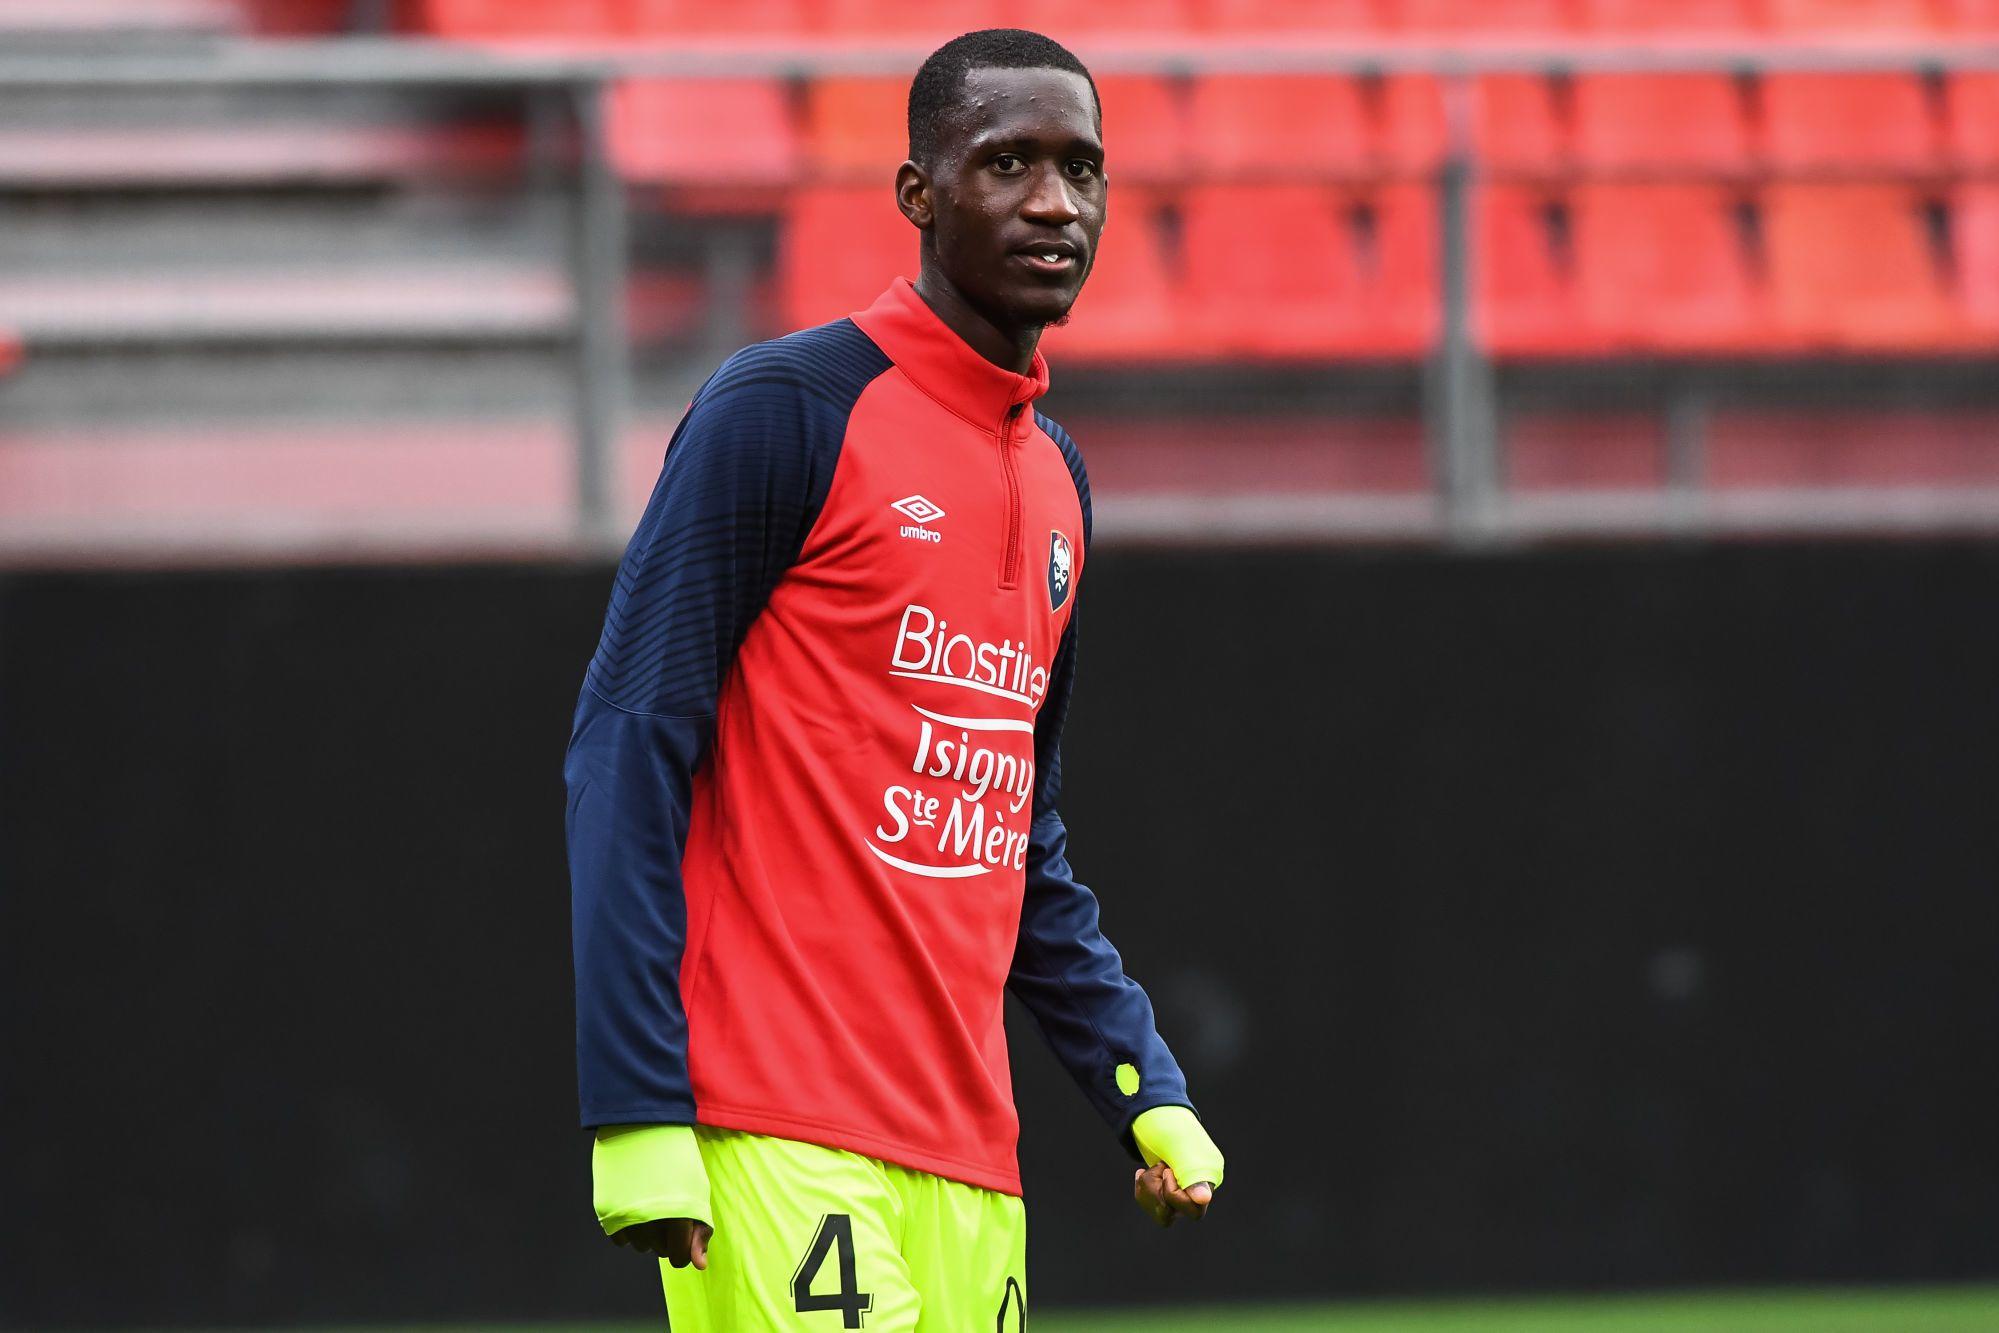 Jason Ngouabi retenu avec l'équipe de France U18